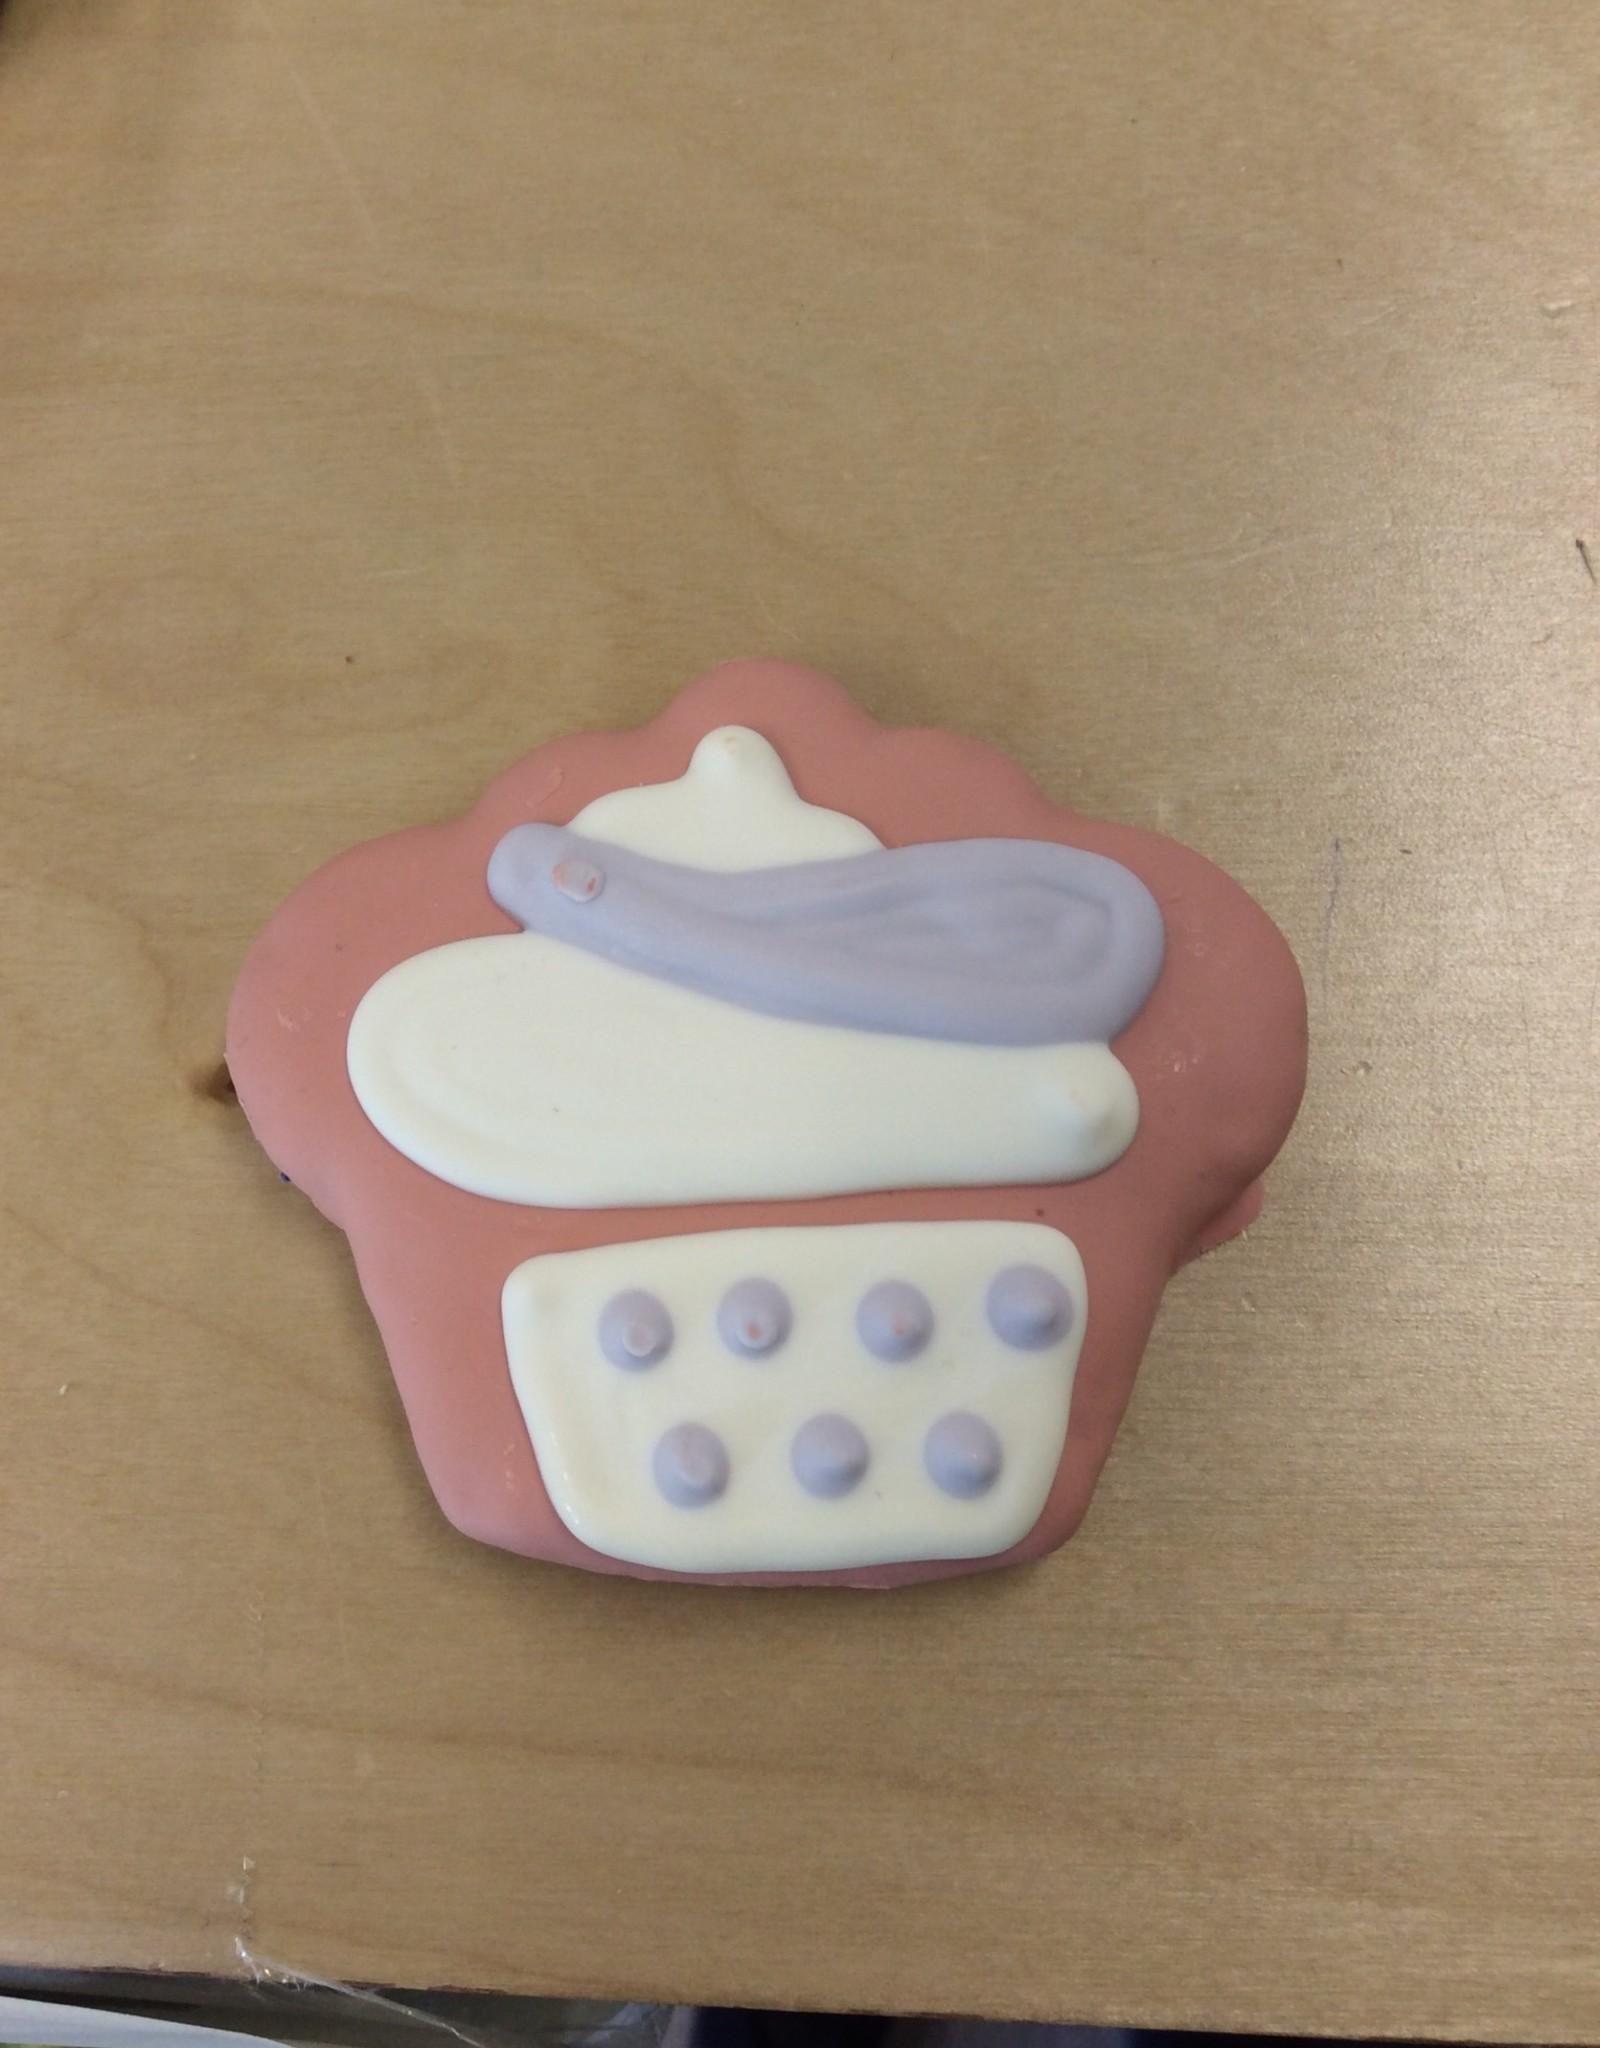 Bosco and Roxy Cupcake Cuties Cookie